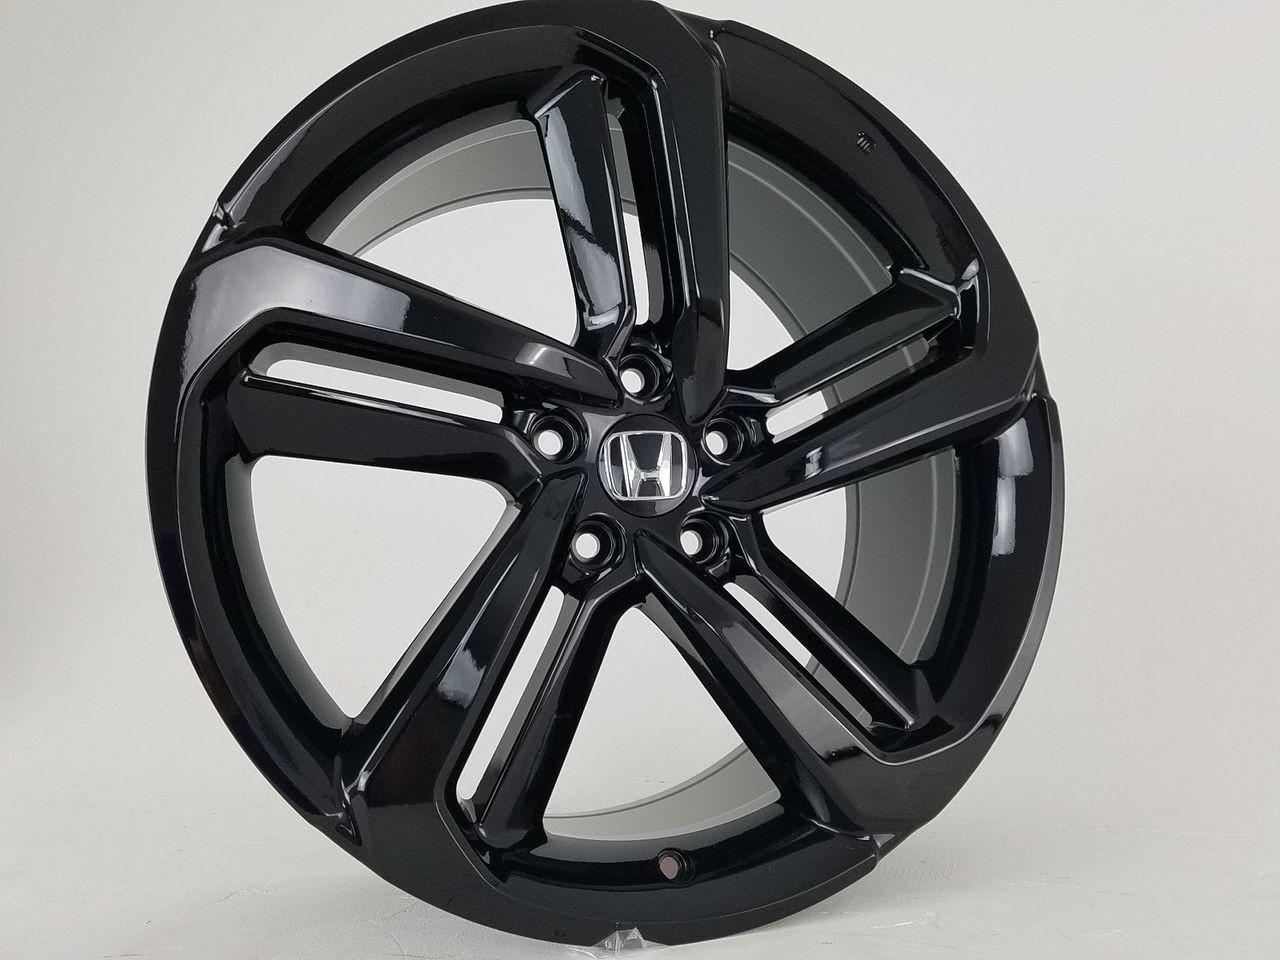 19 2018 19 Fits Honda Accord Sport Civic Si Exl Acura Gloss Black Wheels Set Of 4 19x8 5 Rims Stock Wheel Solutions